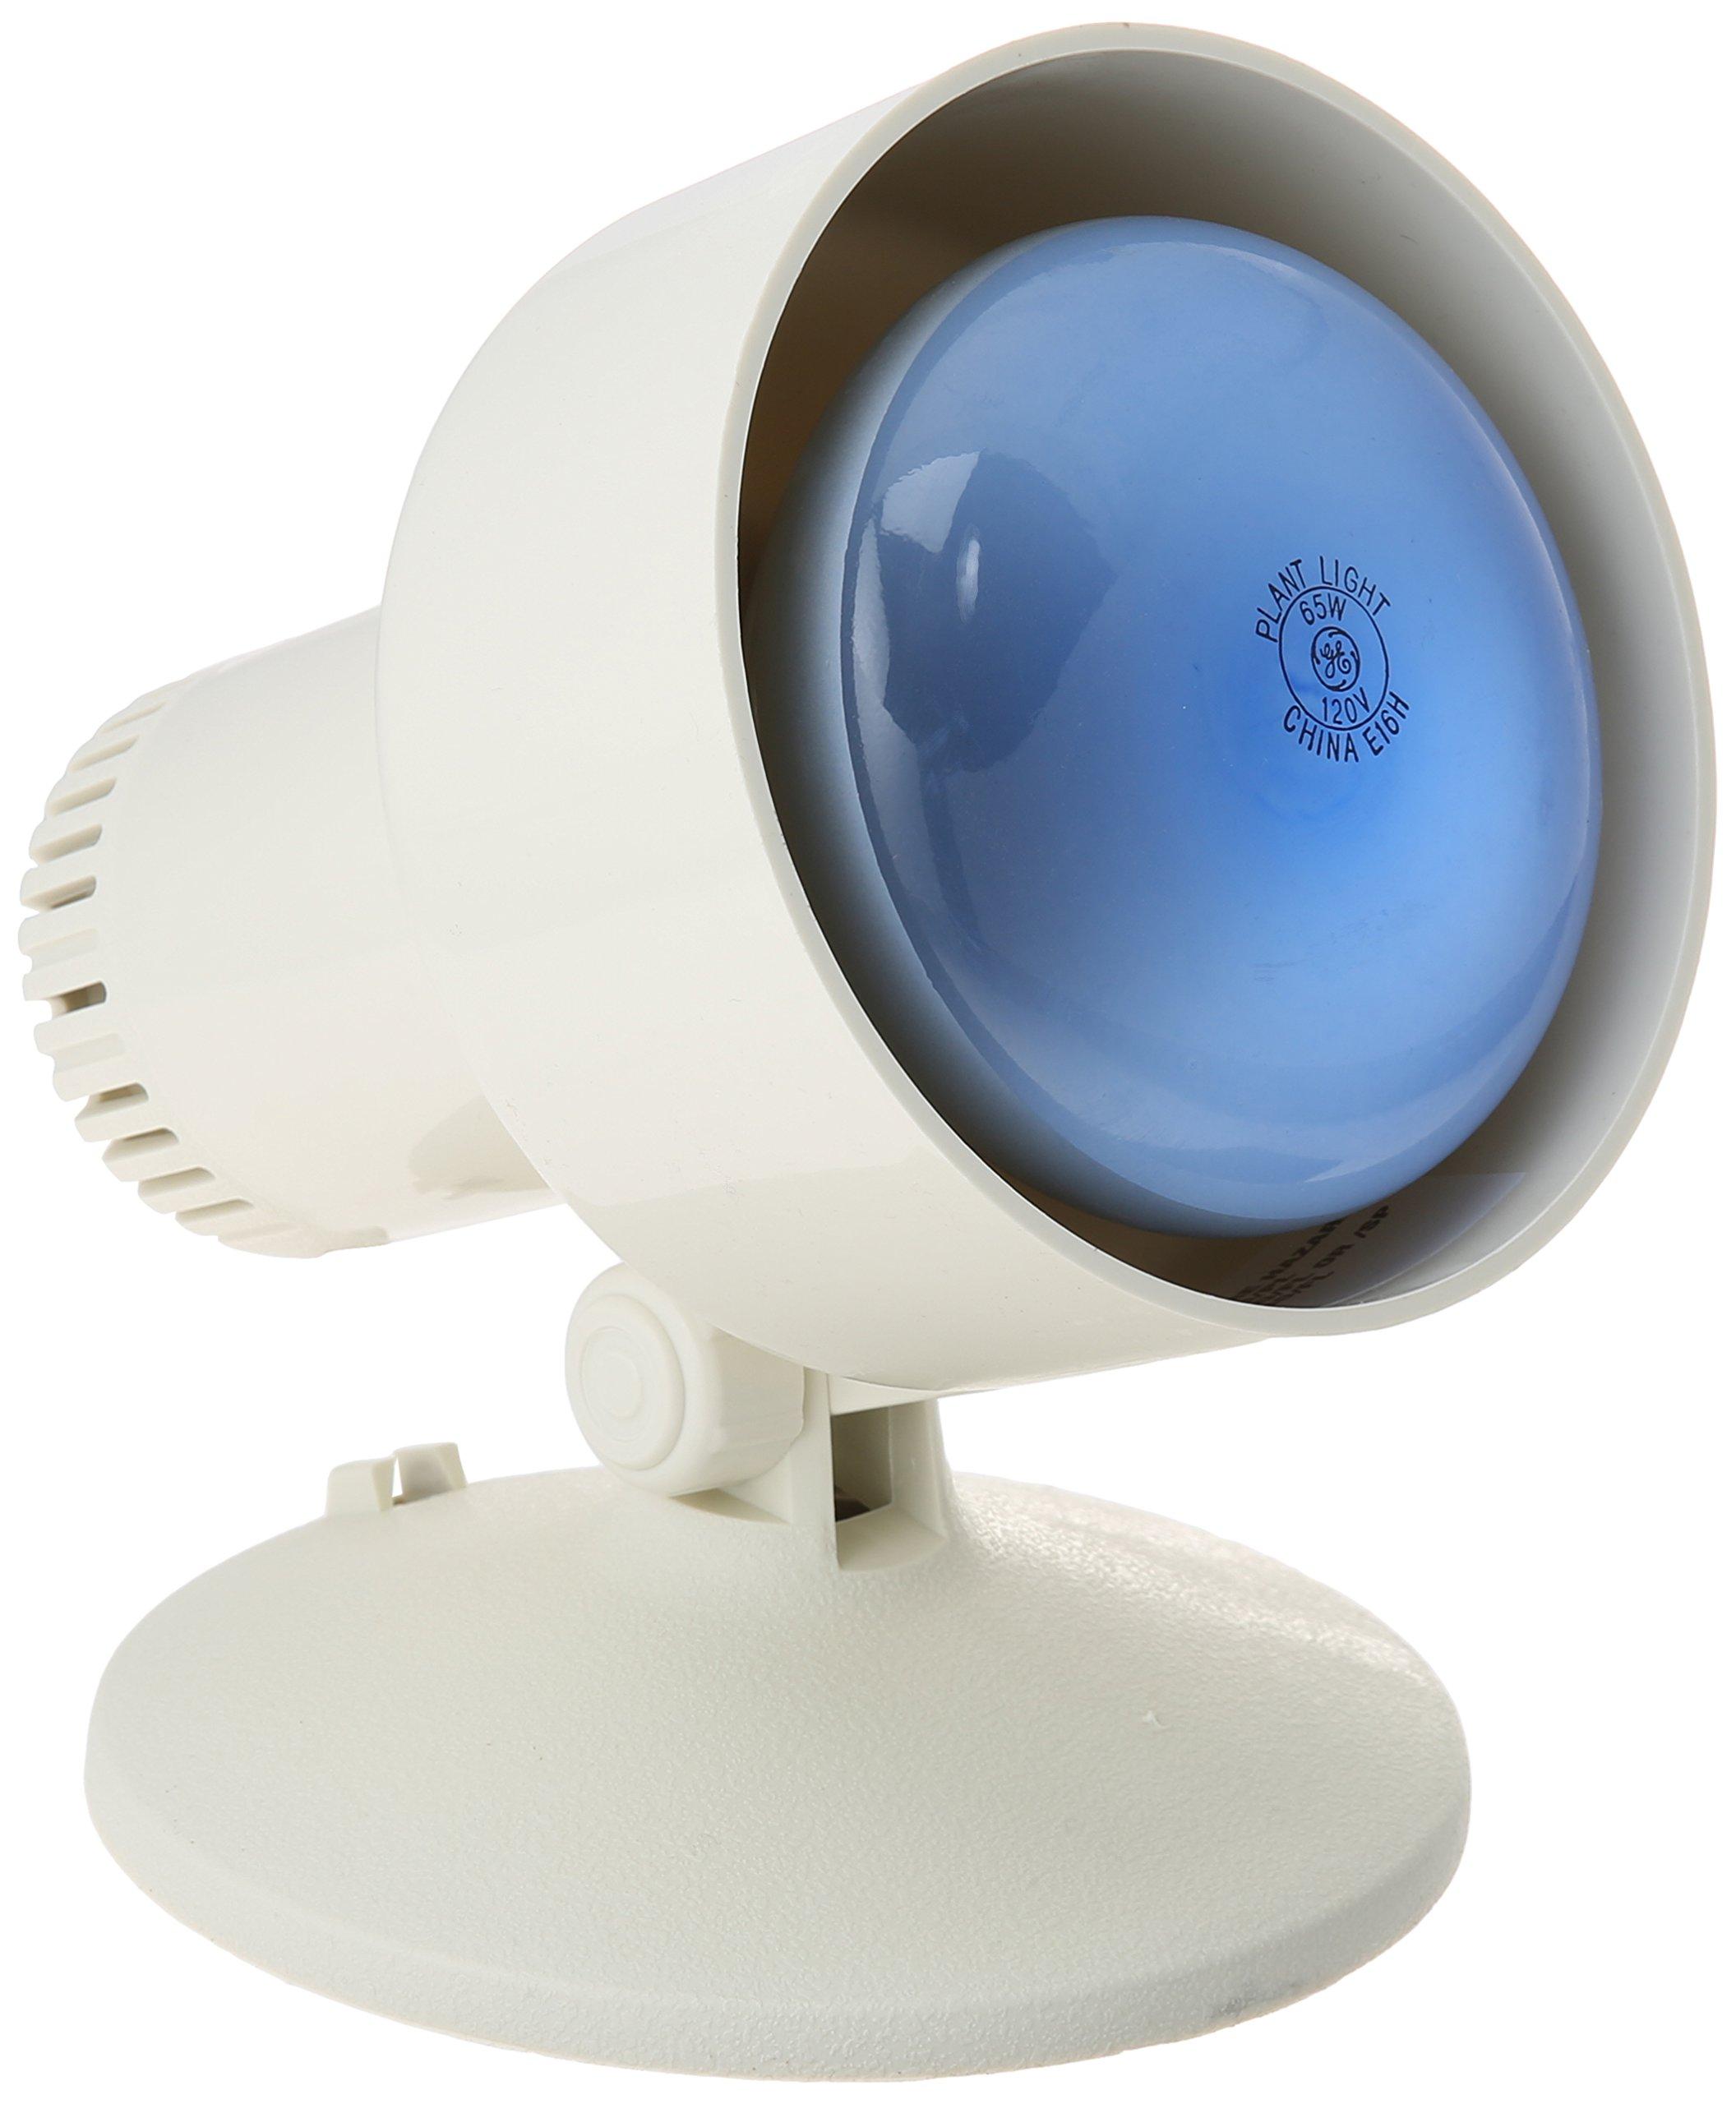 GE Lighting 44848 65-Watt Plant Light Reflector Kit with BR30 Light Bulb and Lamp by GE Lighting